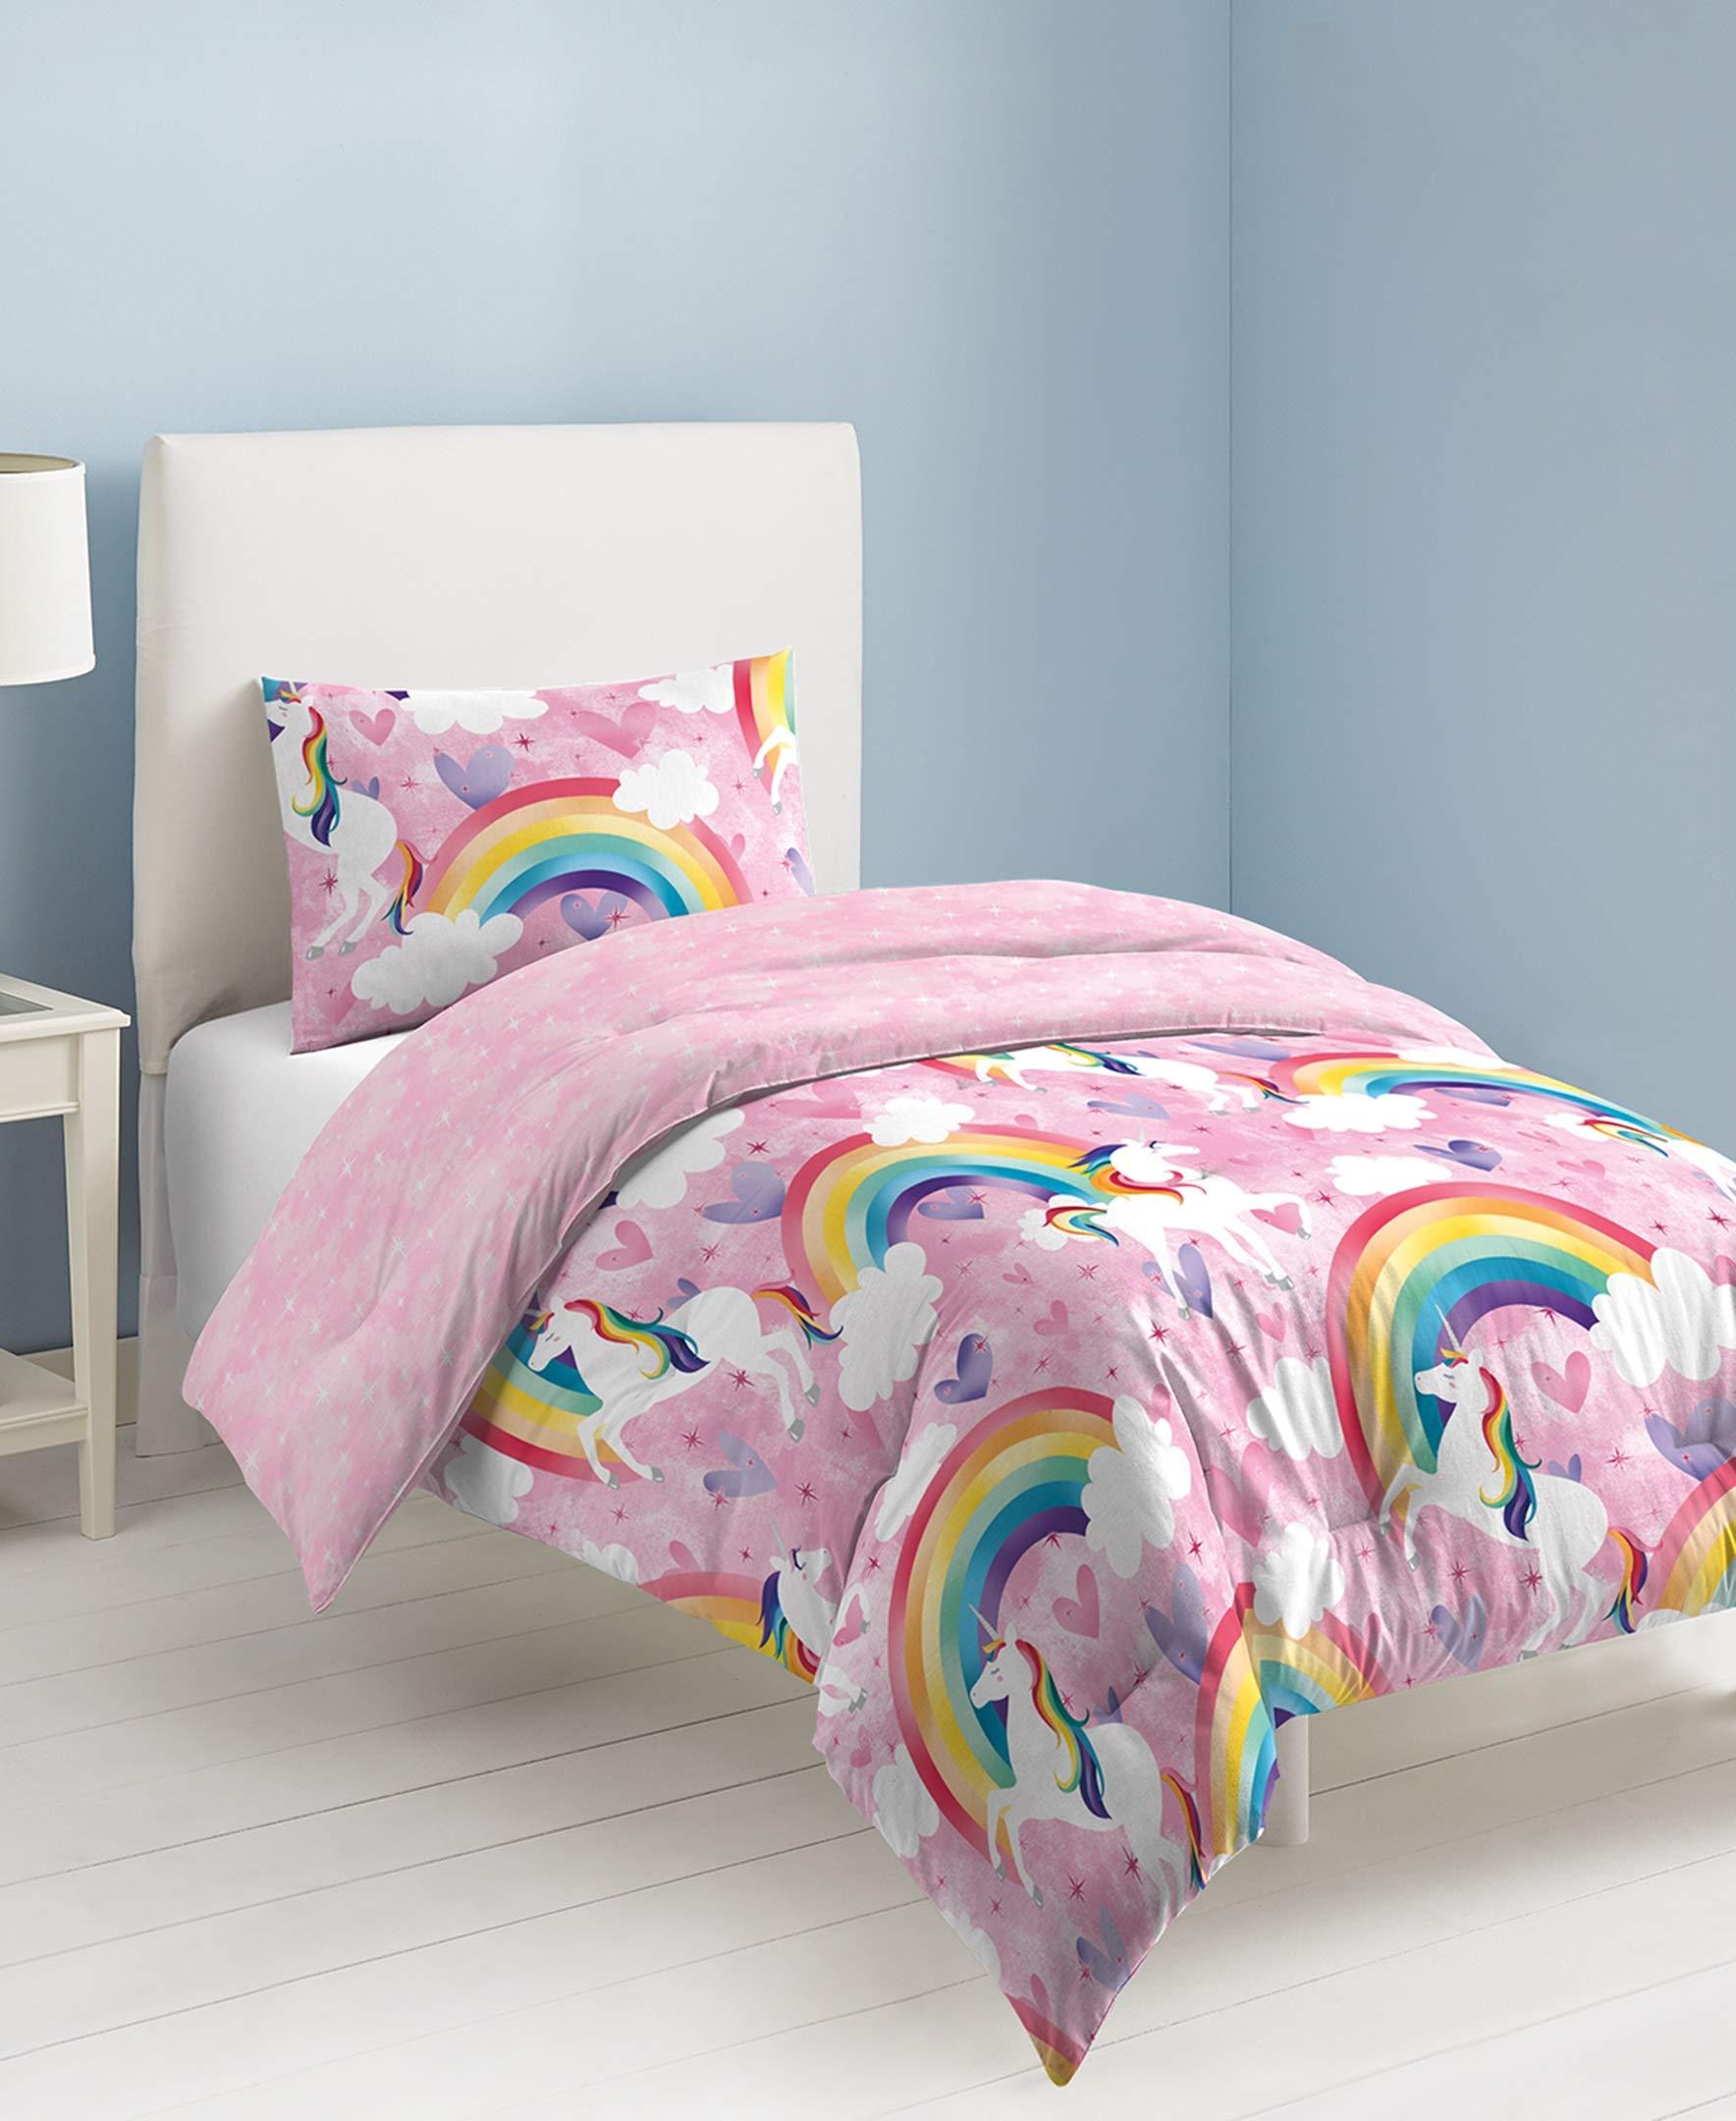 Dream Factory Unicorn Rainbow Comforter Set, Full/Queen, Pink